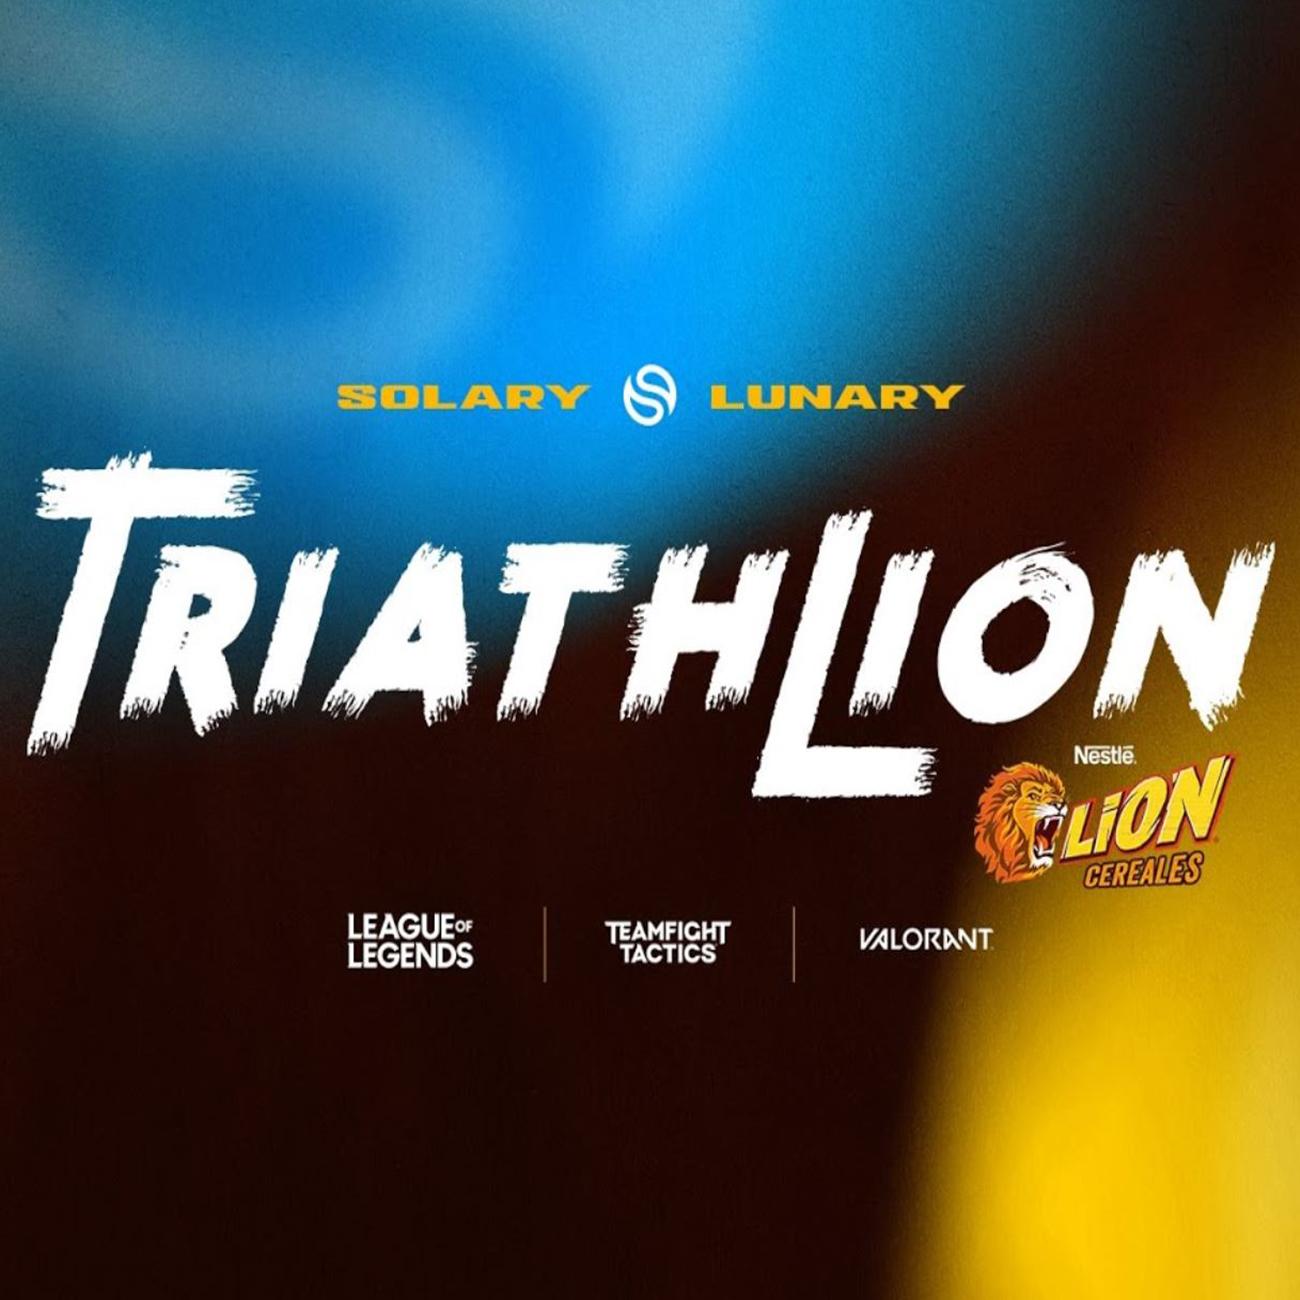 Lion Cereals - Triathlion